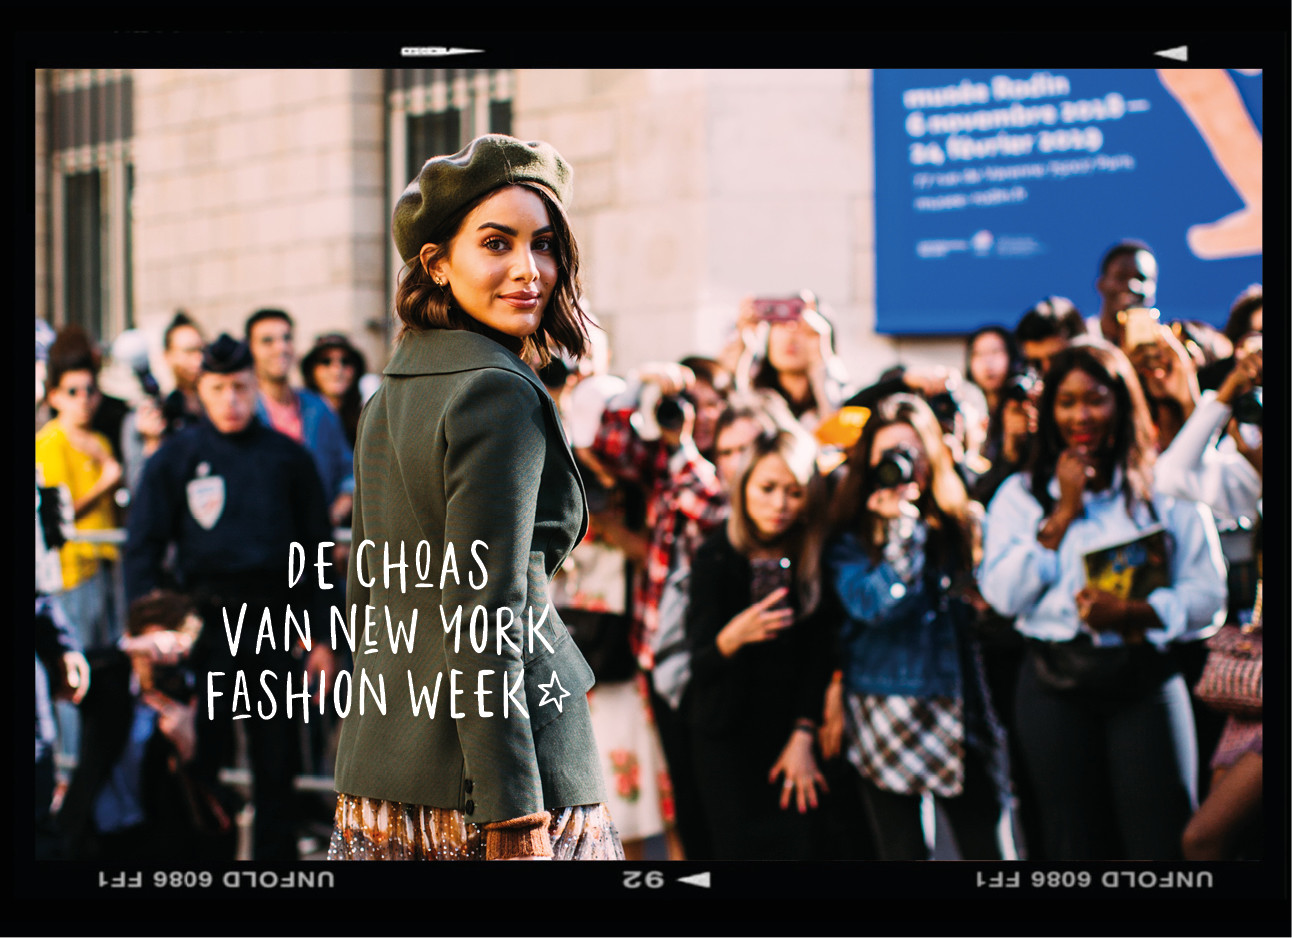 fashionweek streetwear influencer met allemaal fotografen